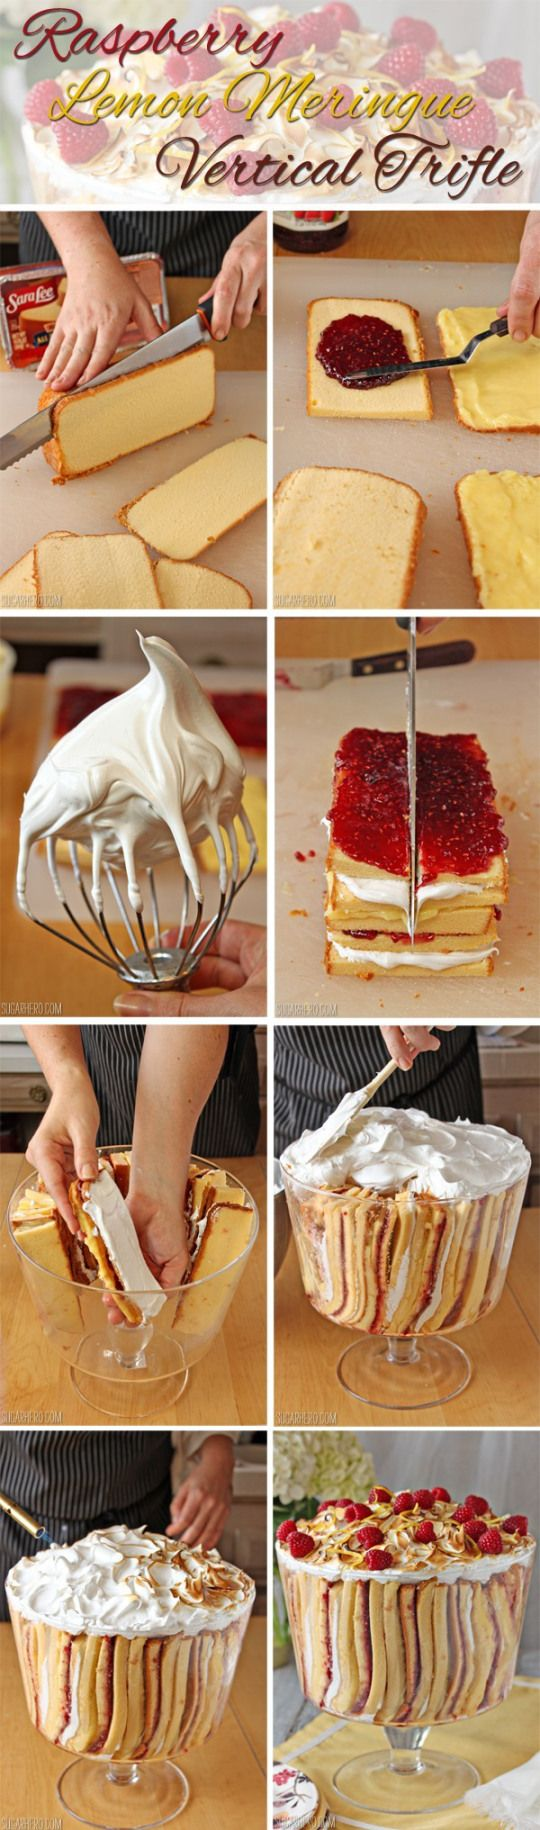 How to Make Raspberry Lemon Meringue Trifle   SugarHero.com